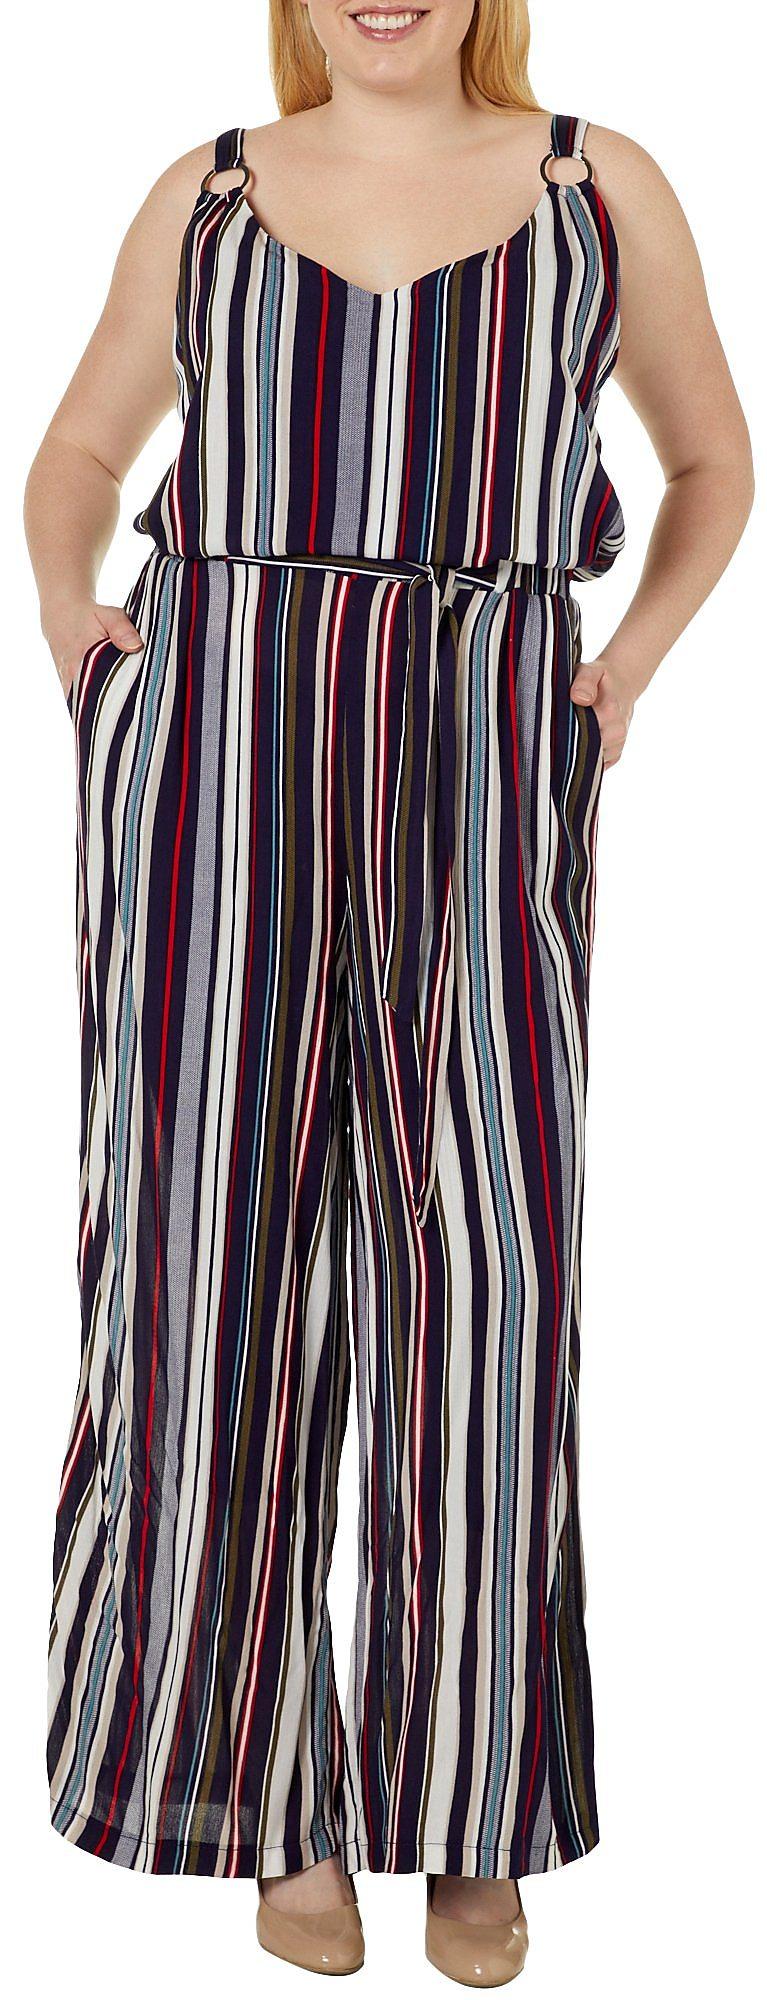 581daac5293 Derek Heart Juniors Plus Striped Tie Waist Jumpsuit